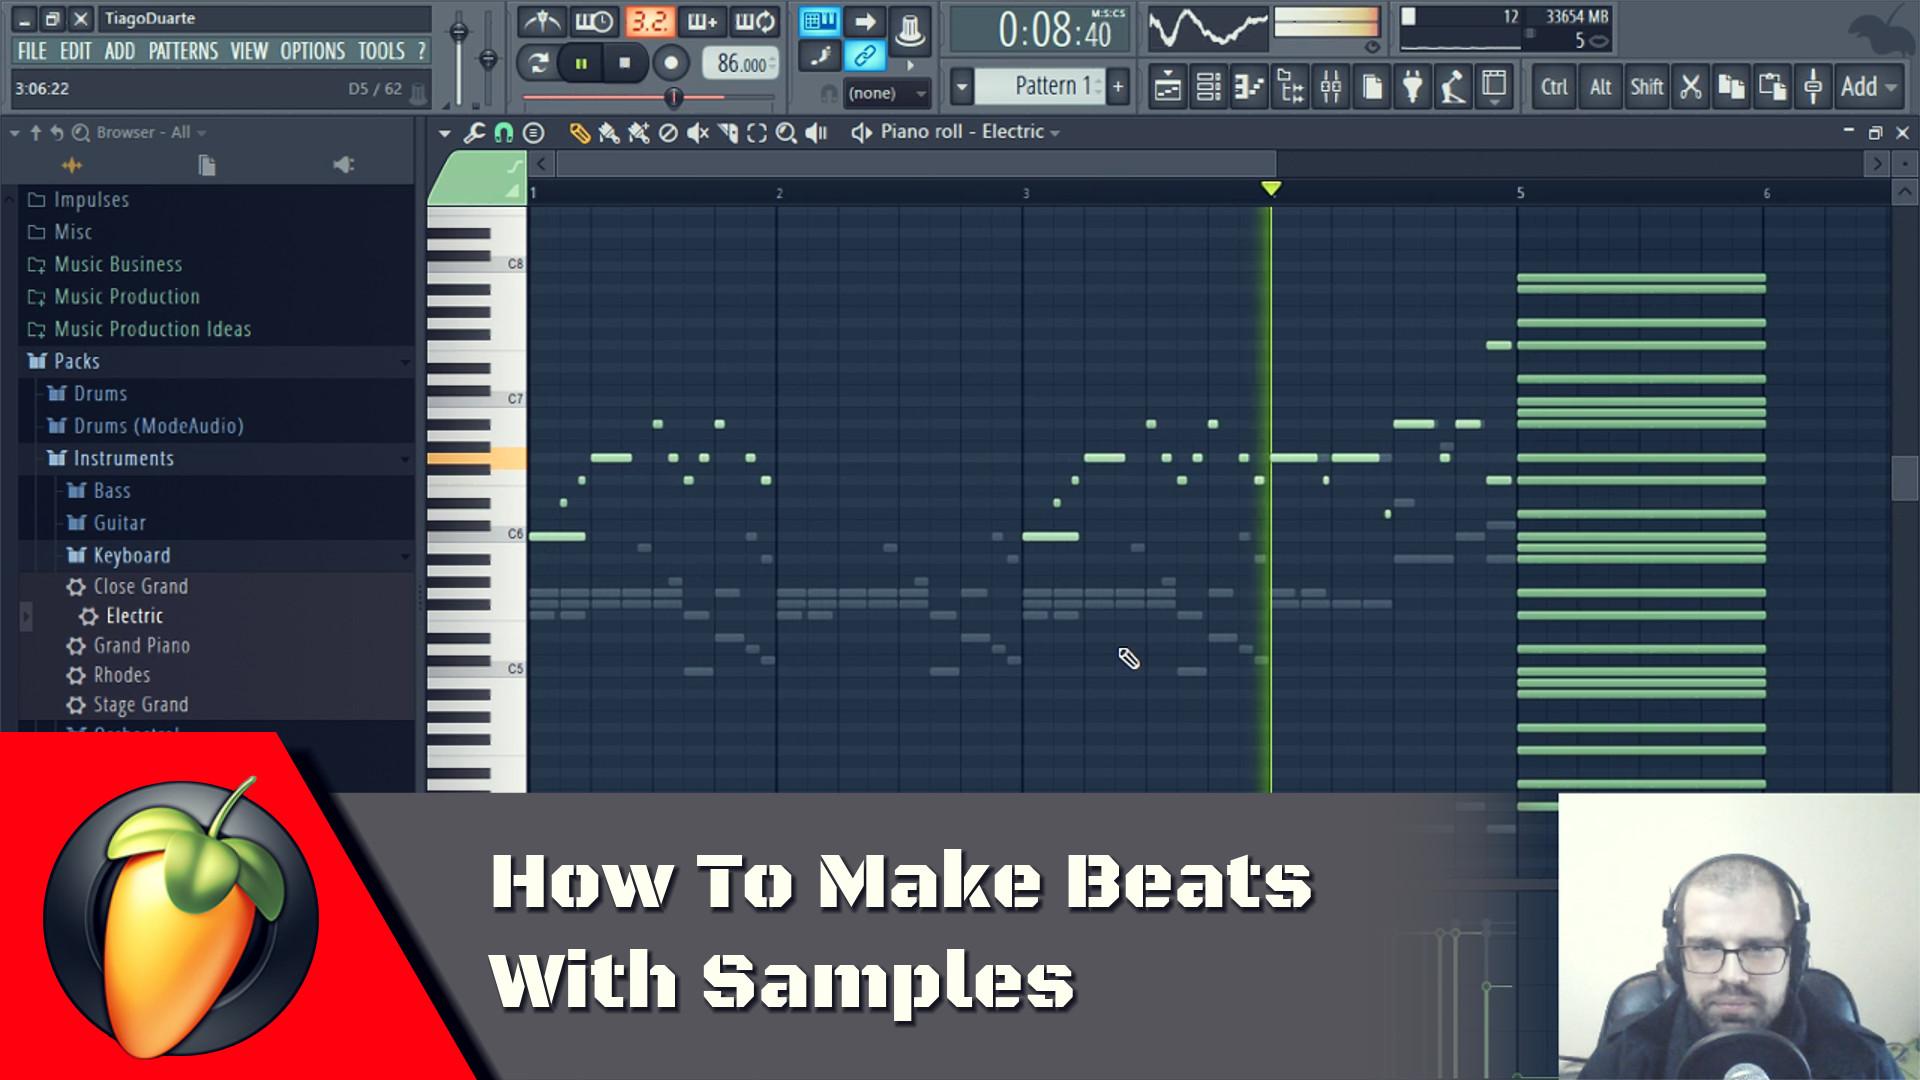 Make Beats With Samples